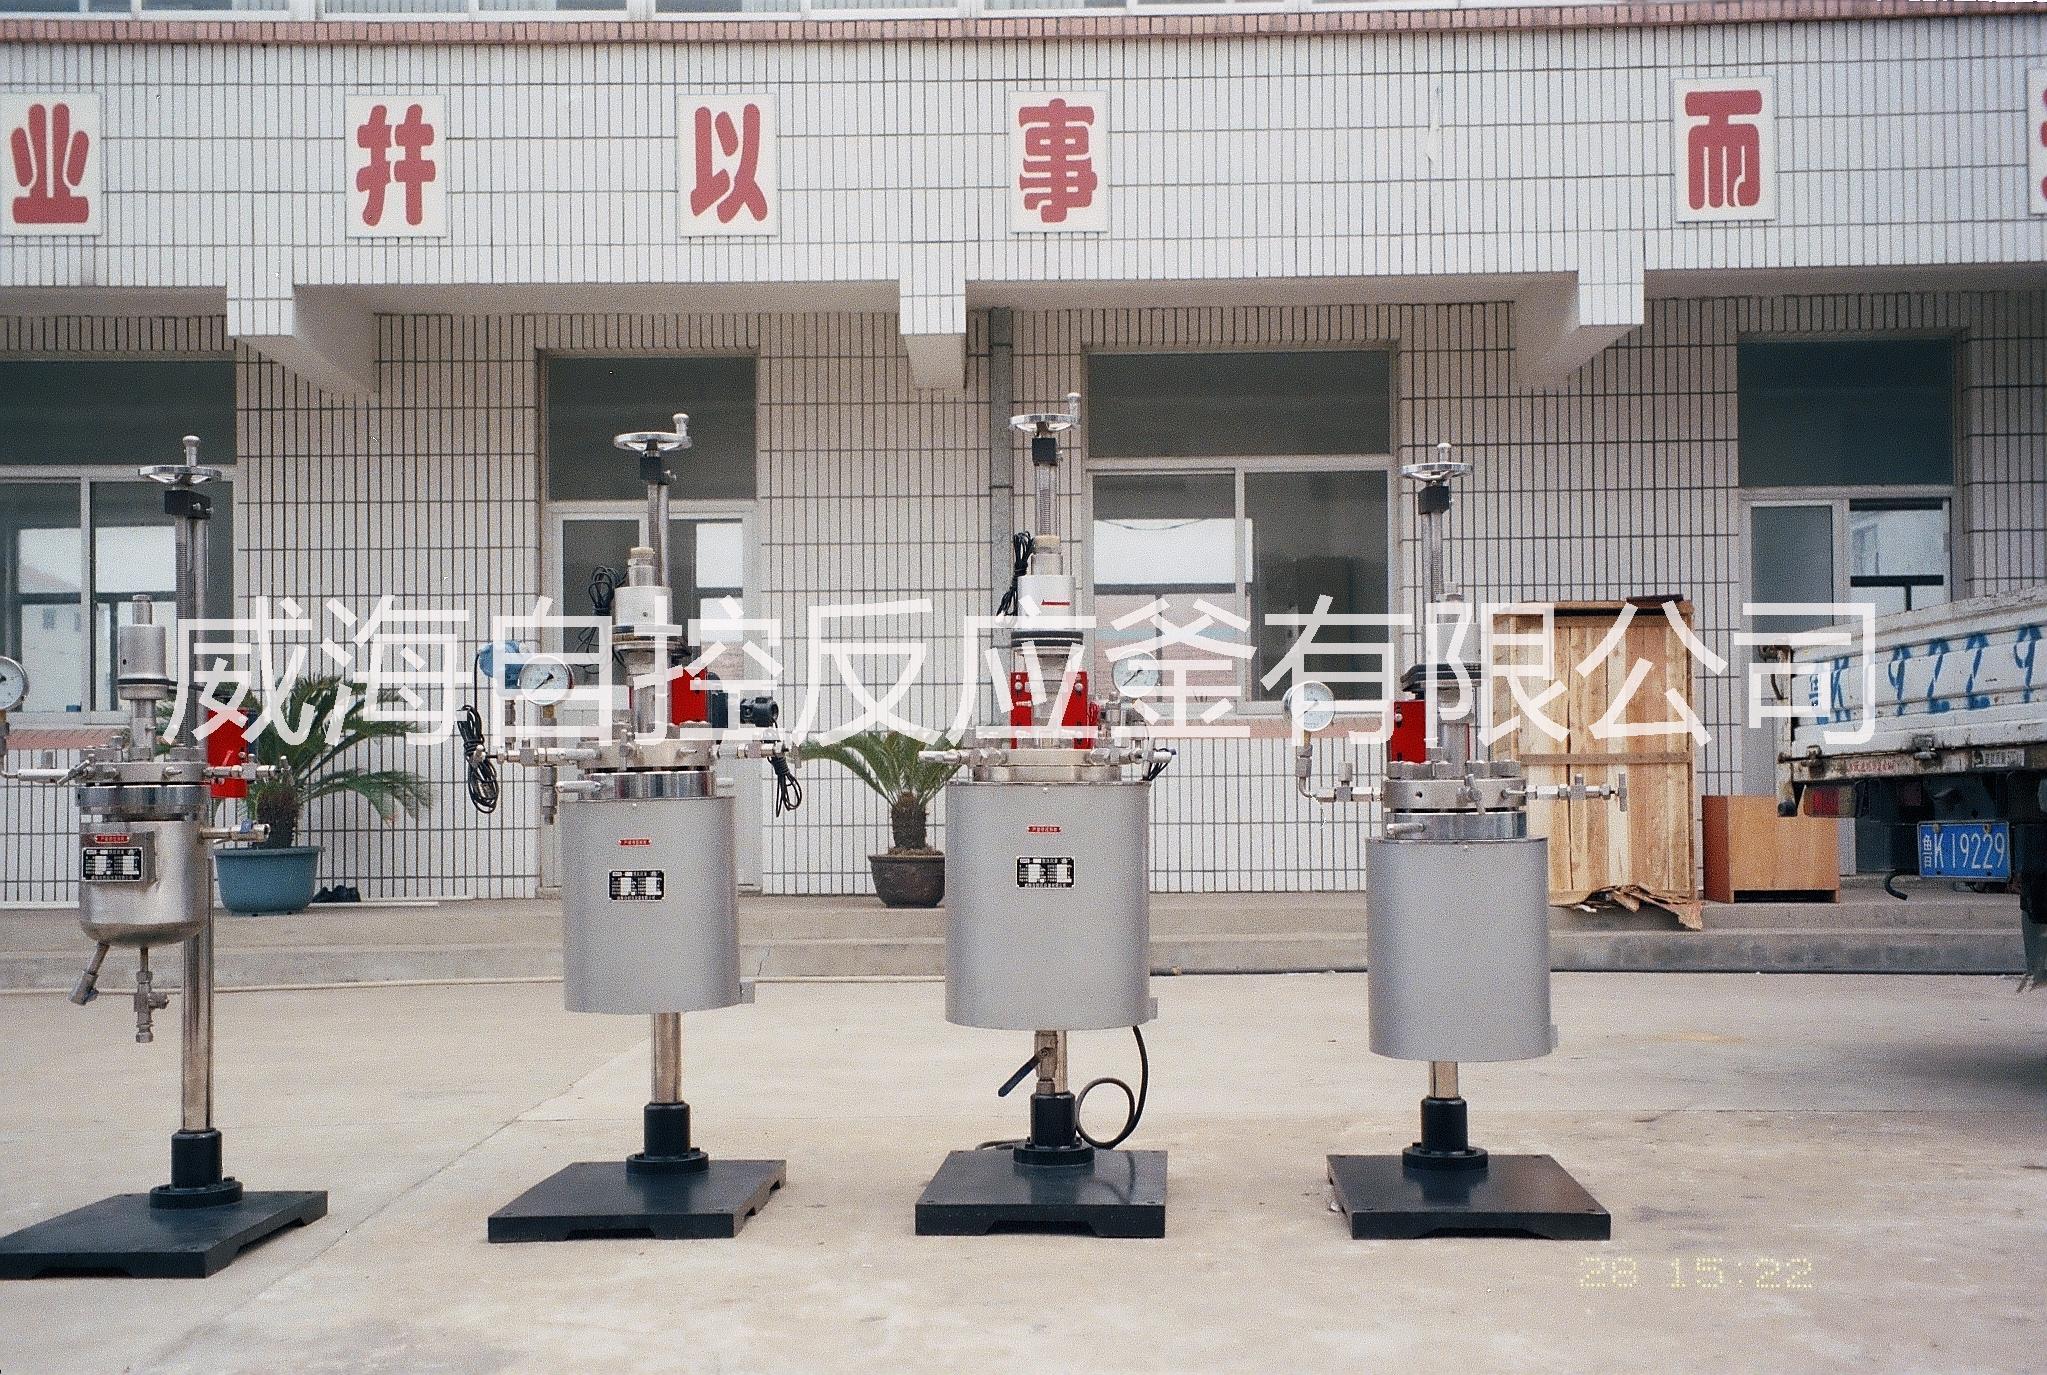 10L高压反应釜 10L高压反应釜优质供应商 10L高压反应釜厂家报价